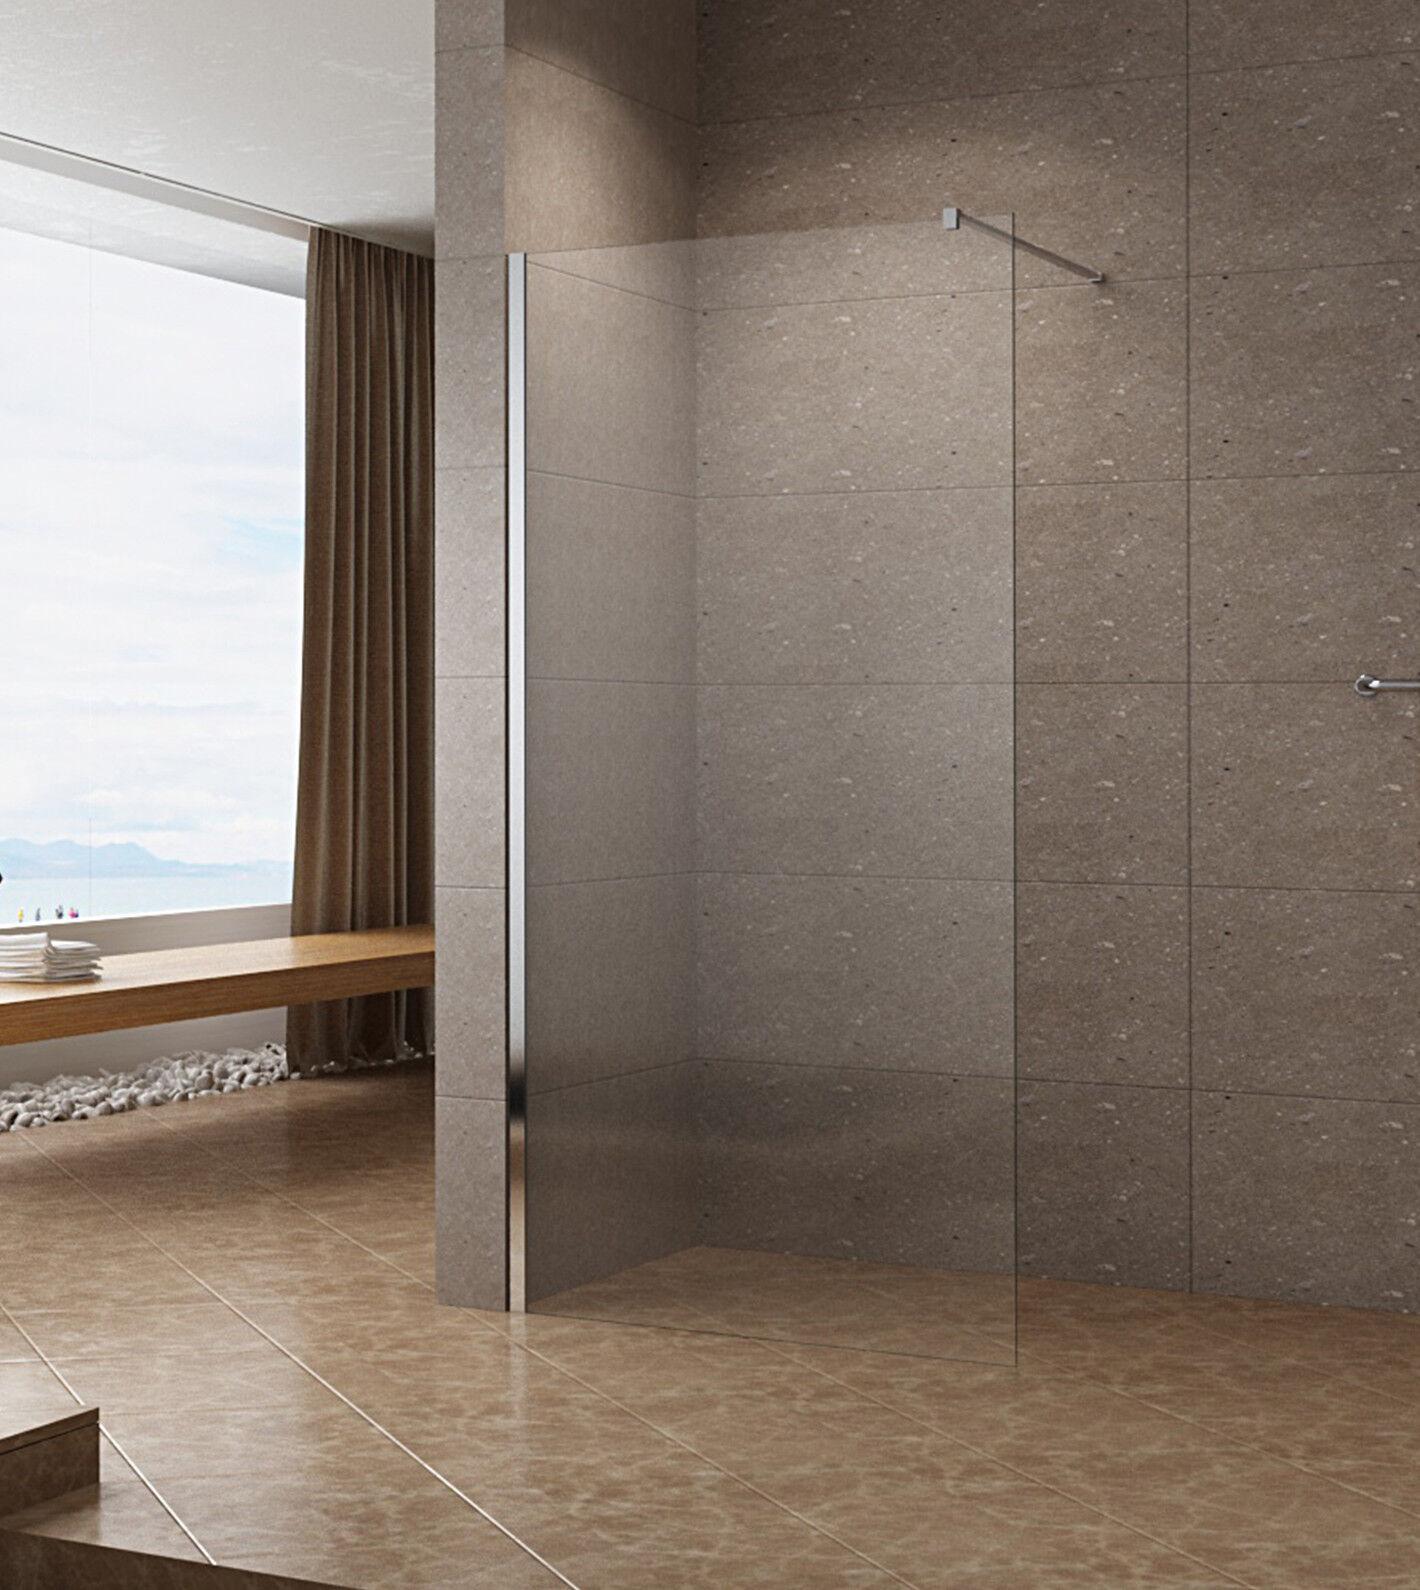 10mm Walkin Dusche Duschabtrennung Duschwand NANO ESG Glas Duschtür 120x200cm